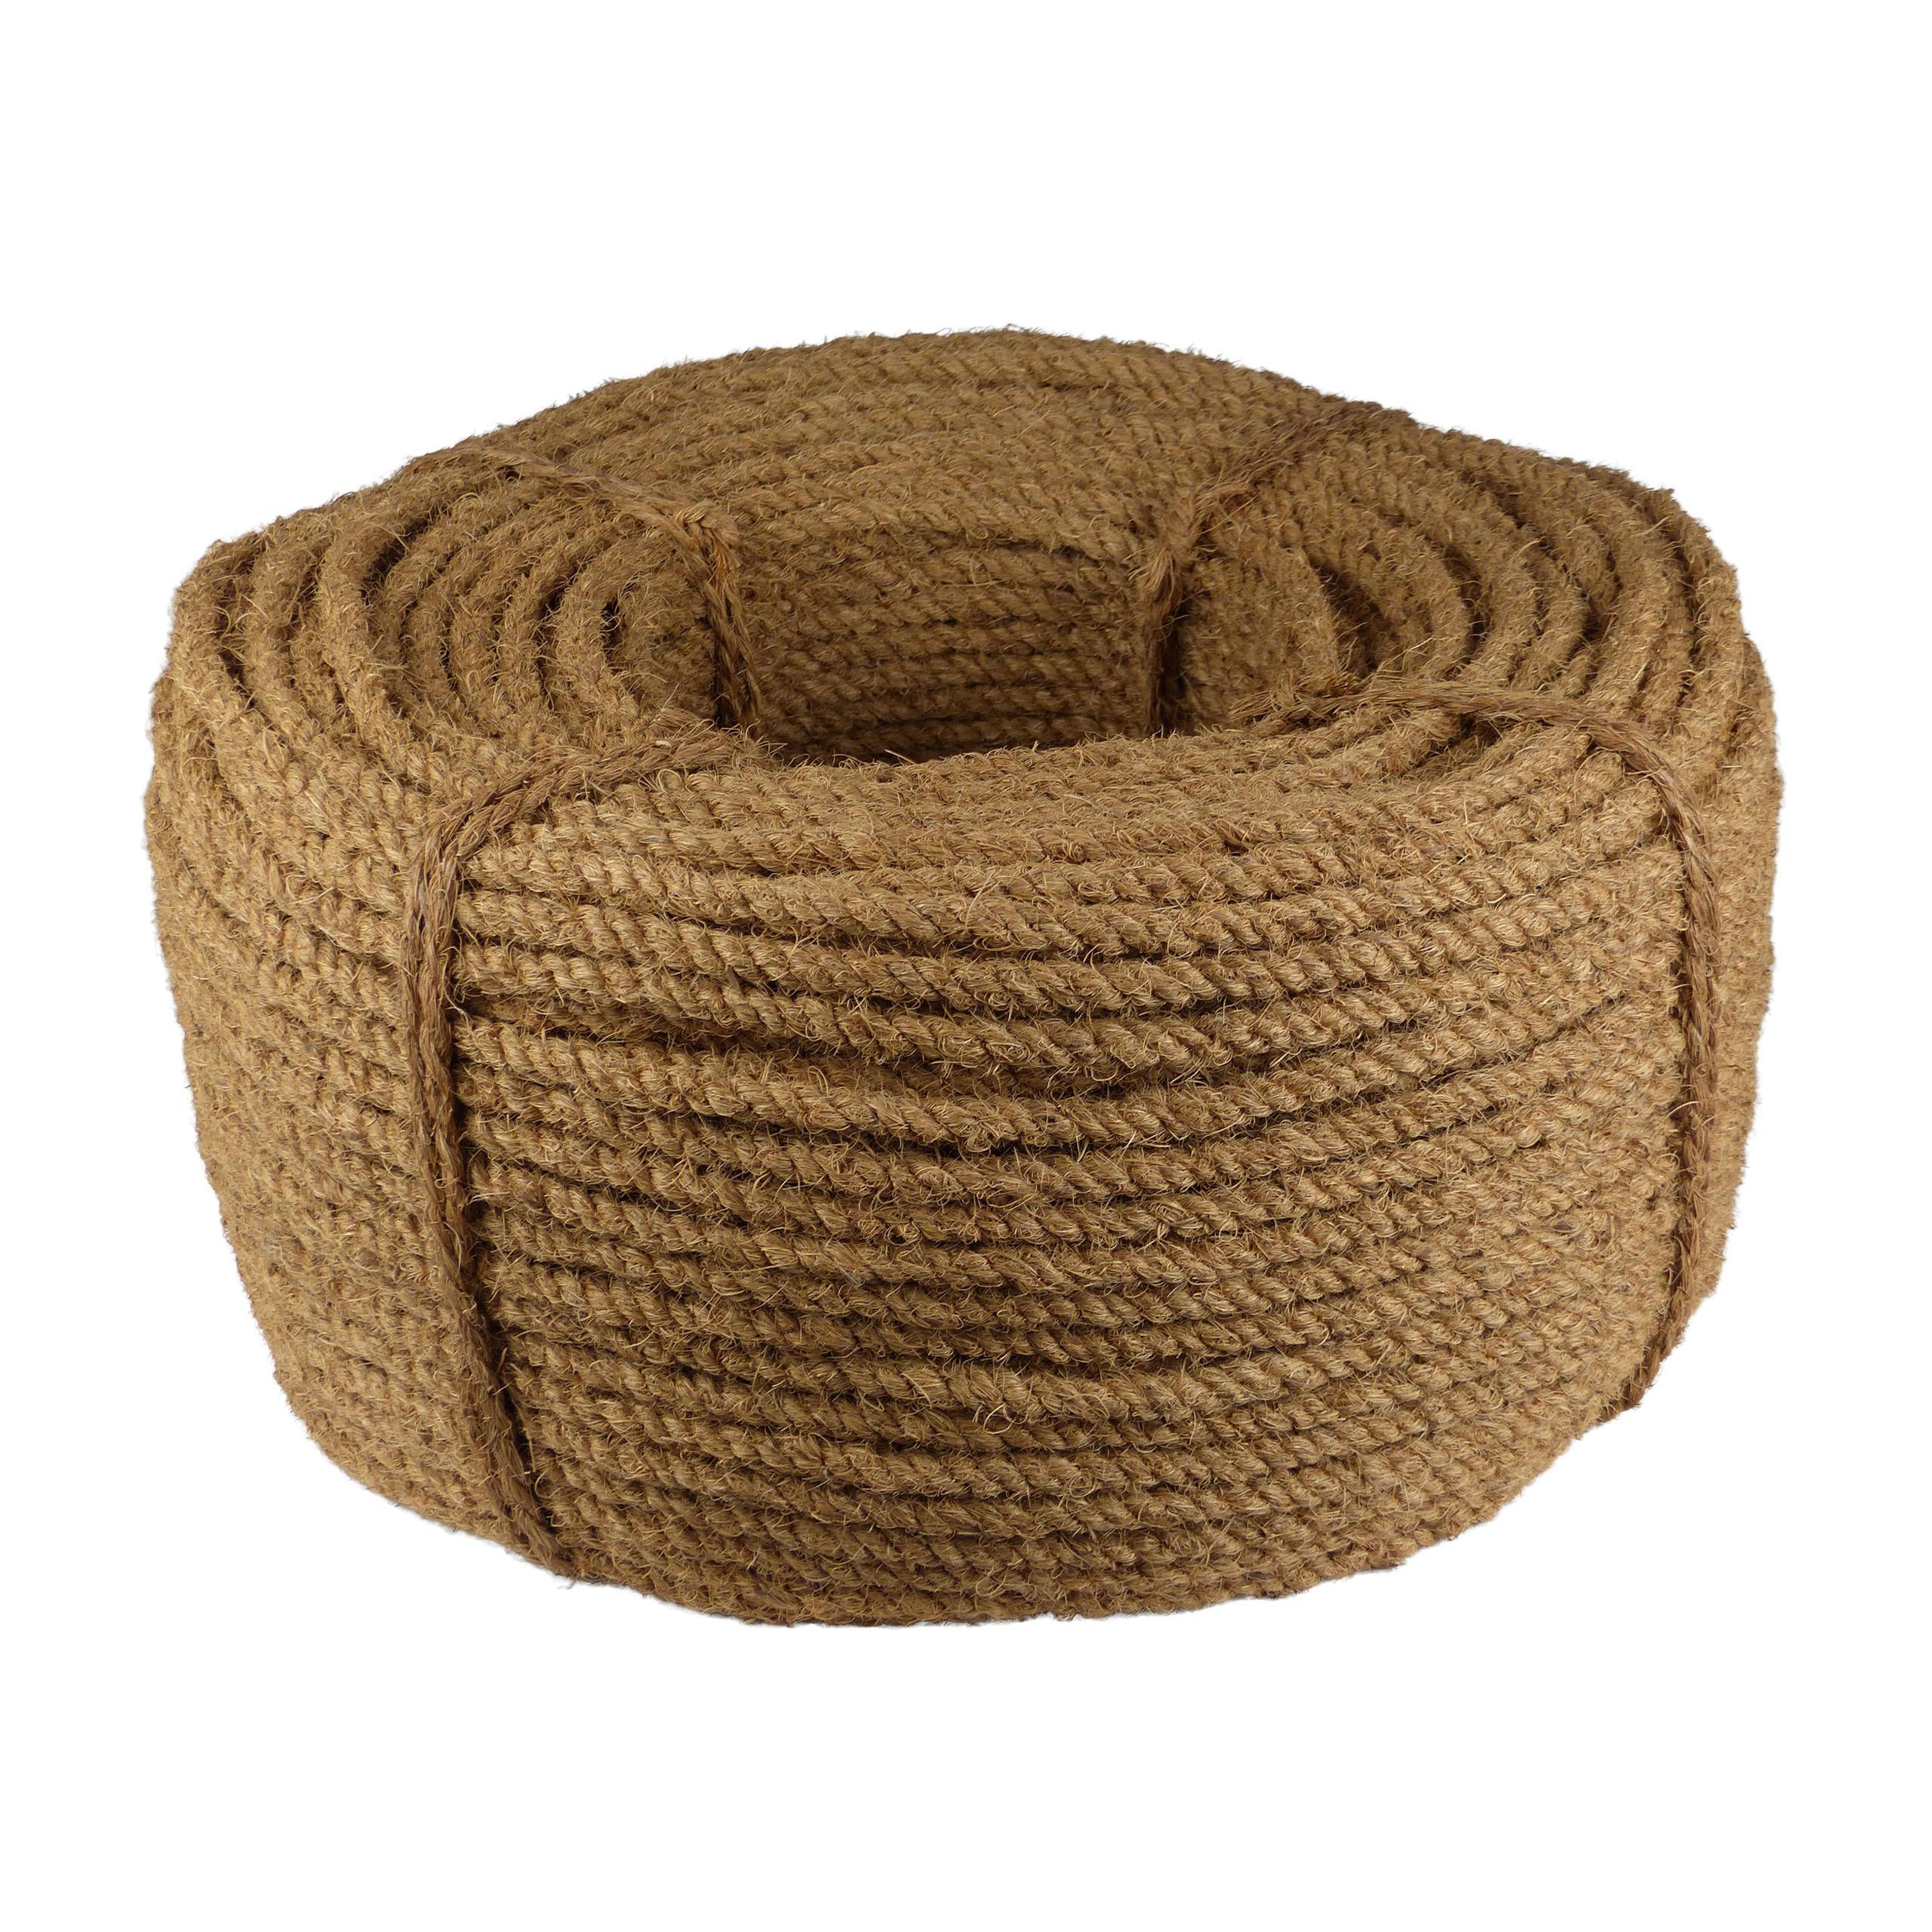 Kokosseil - Baumbindeband - Naturseil - Länge 200m - Stärke ca. 10 mm - 1